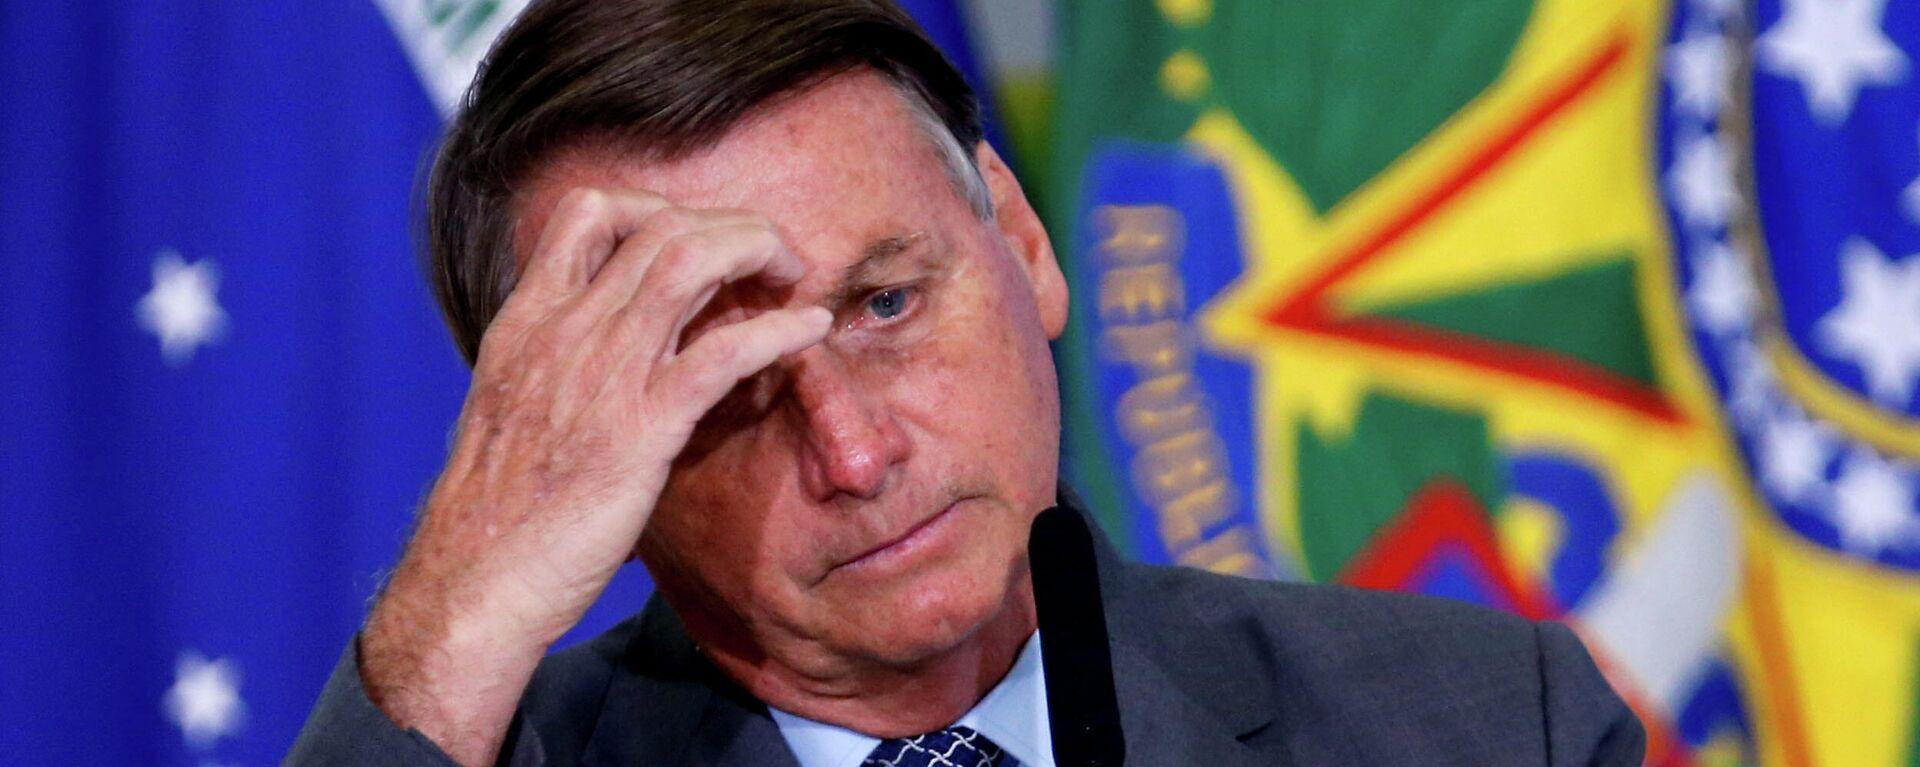 Jair Bolsonaro, presidente de Brasil - Sputnik Mundo, 1920, 01.06.2021